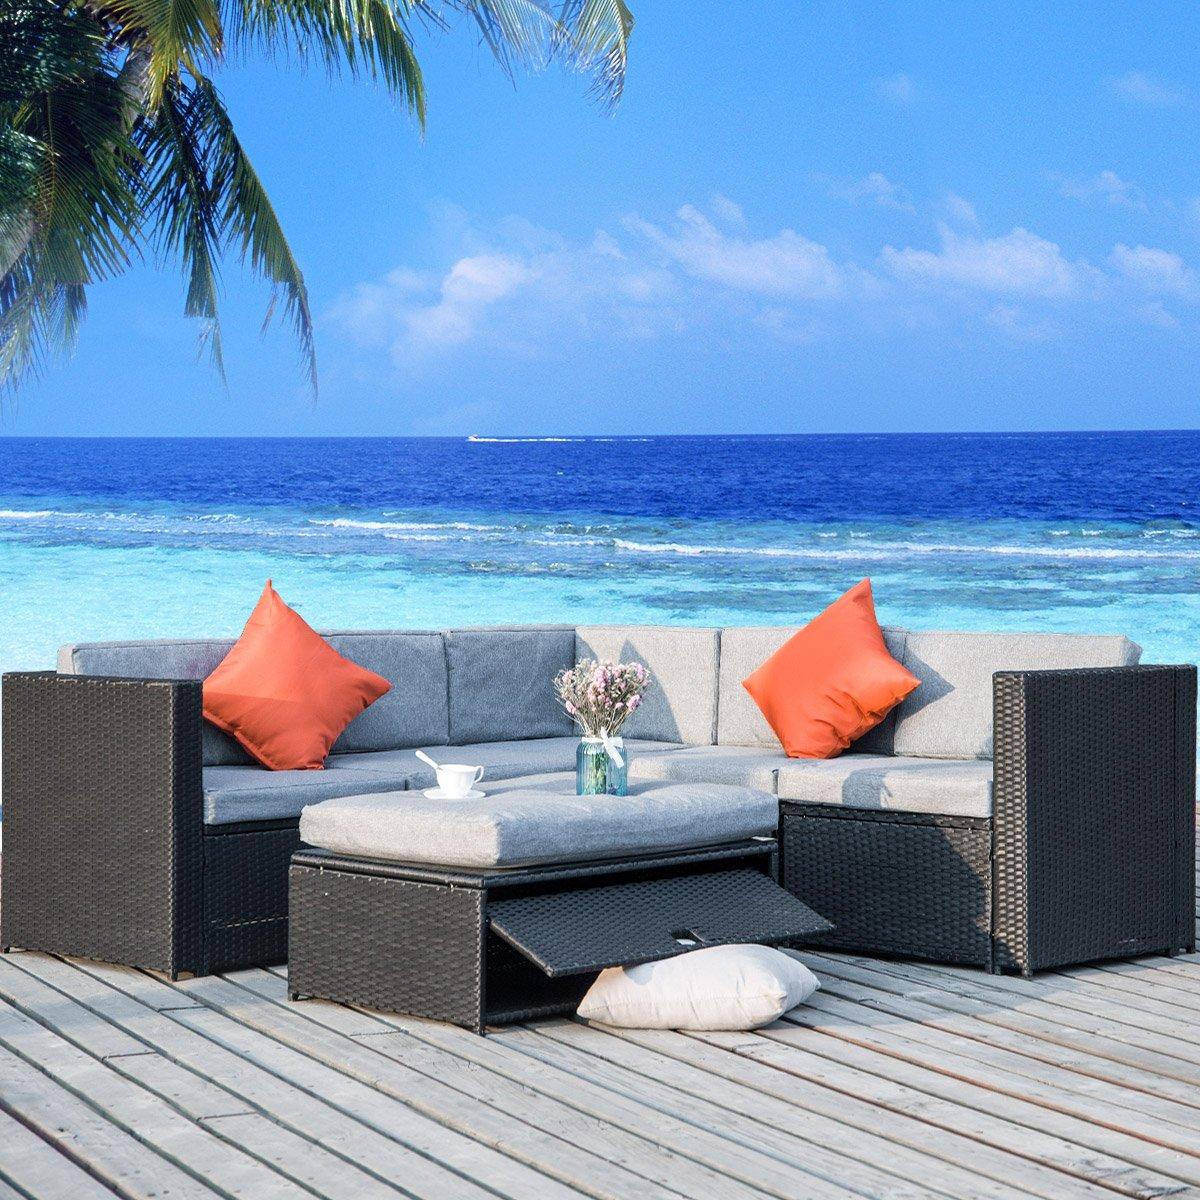 Merax 4 Piece Cushioned Outdoor Patio PE Rattan Furniture Set Sectional Garden Sofa (Black wicker + Grey cushion)